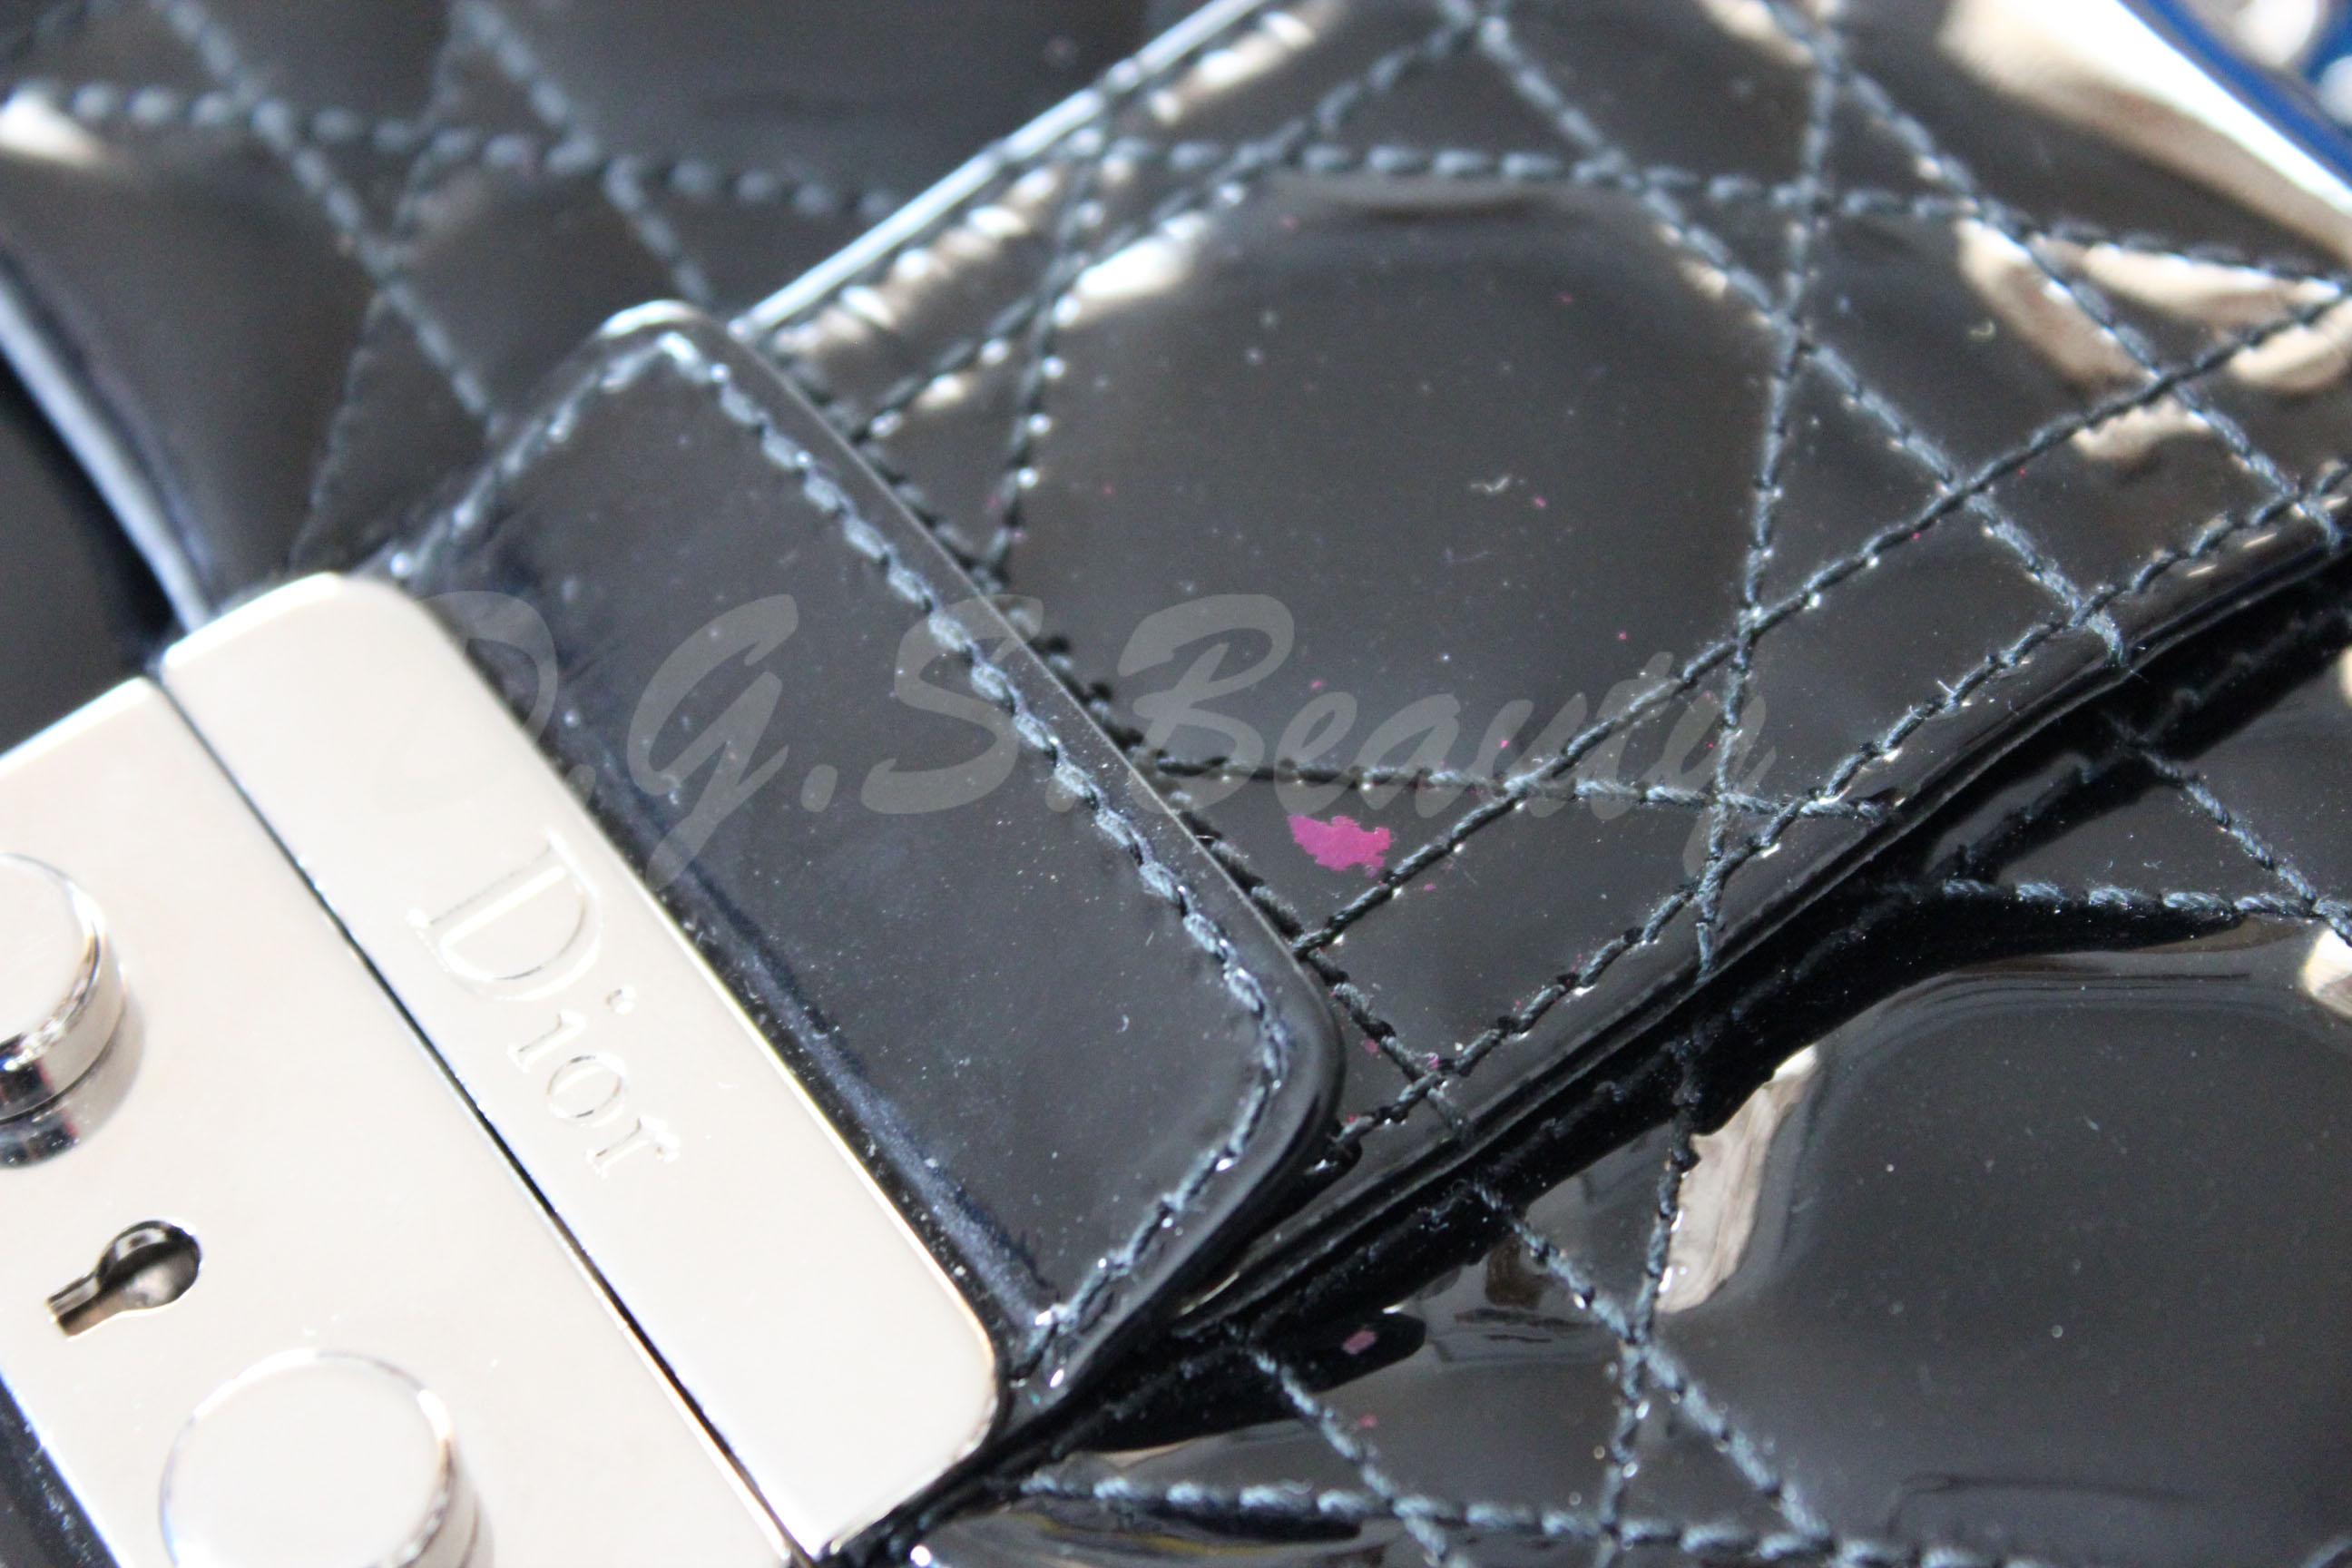 Nail Polish on my Dior Handbag?!